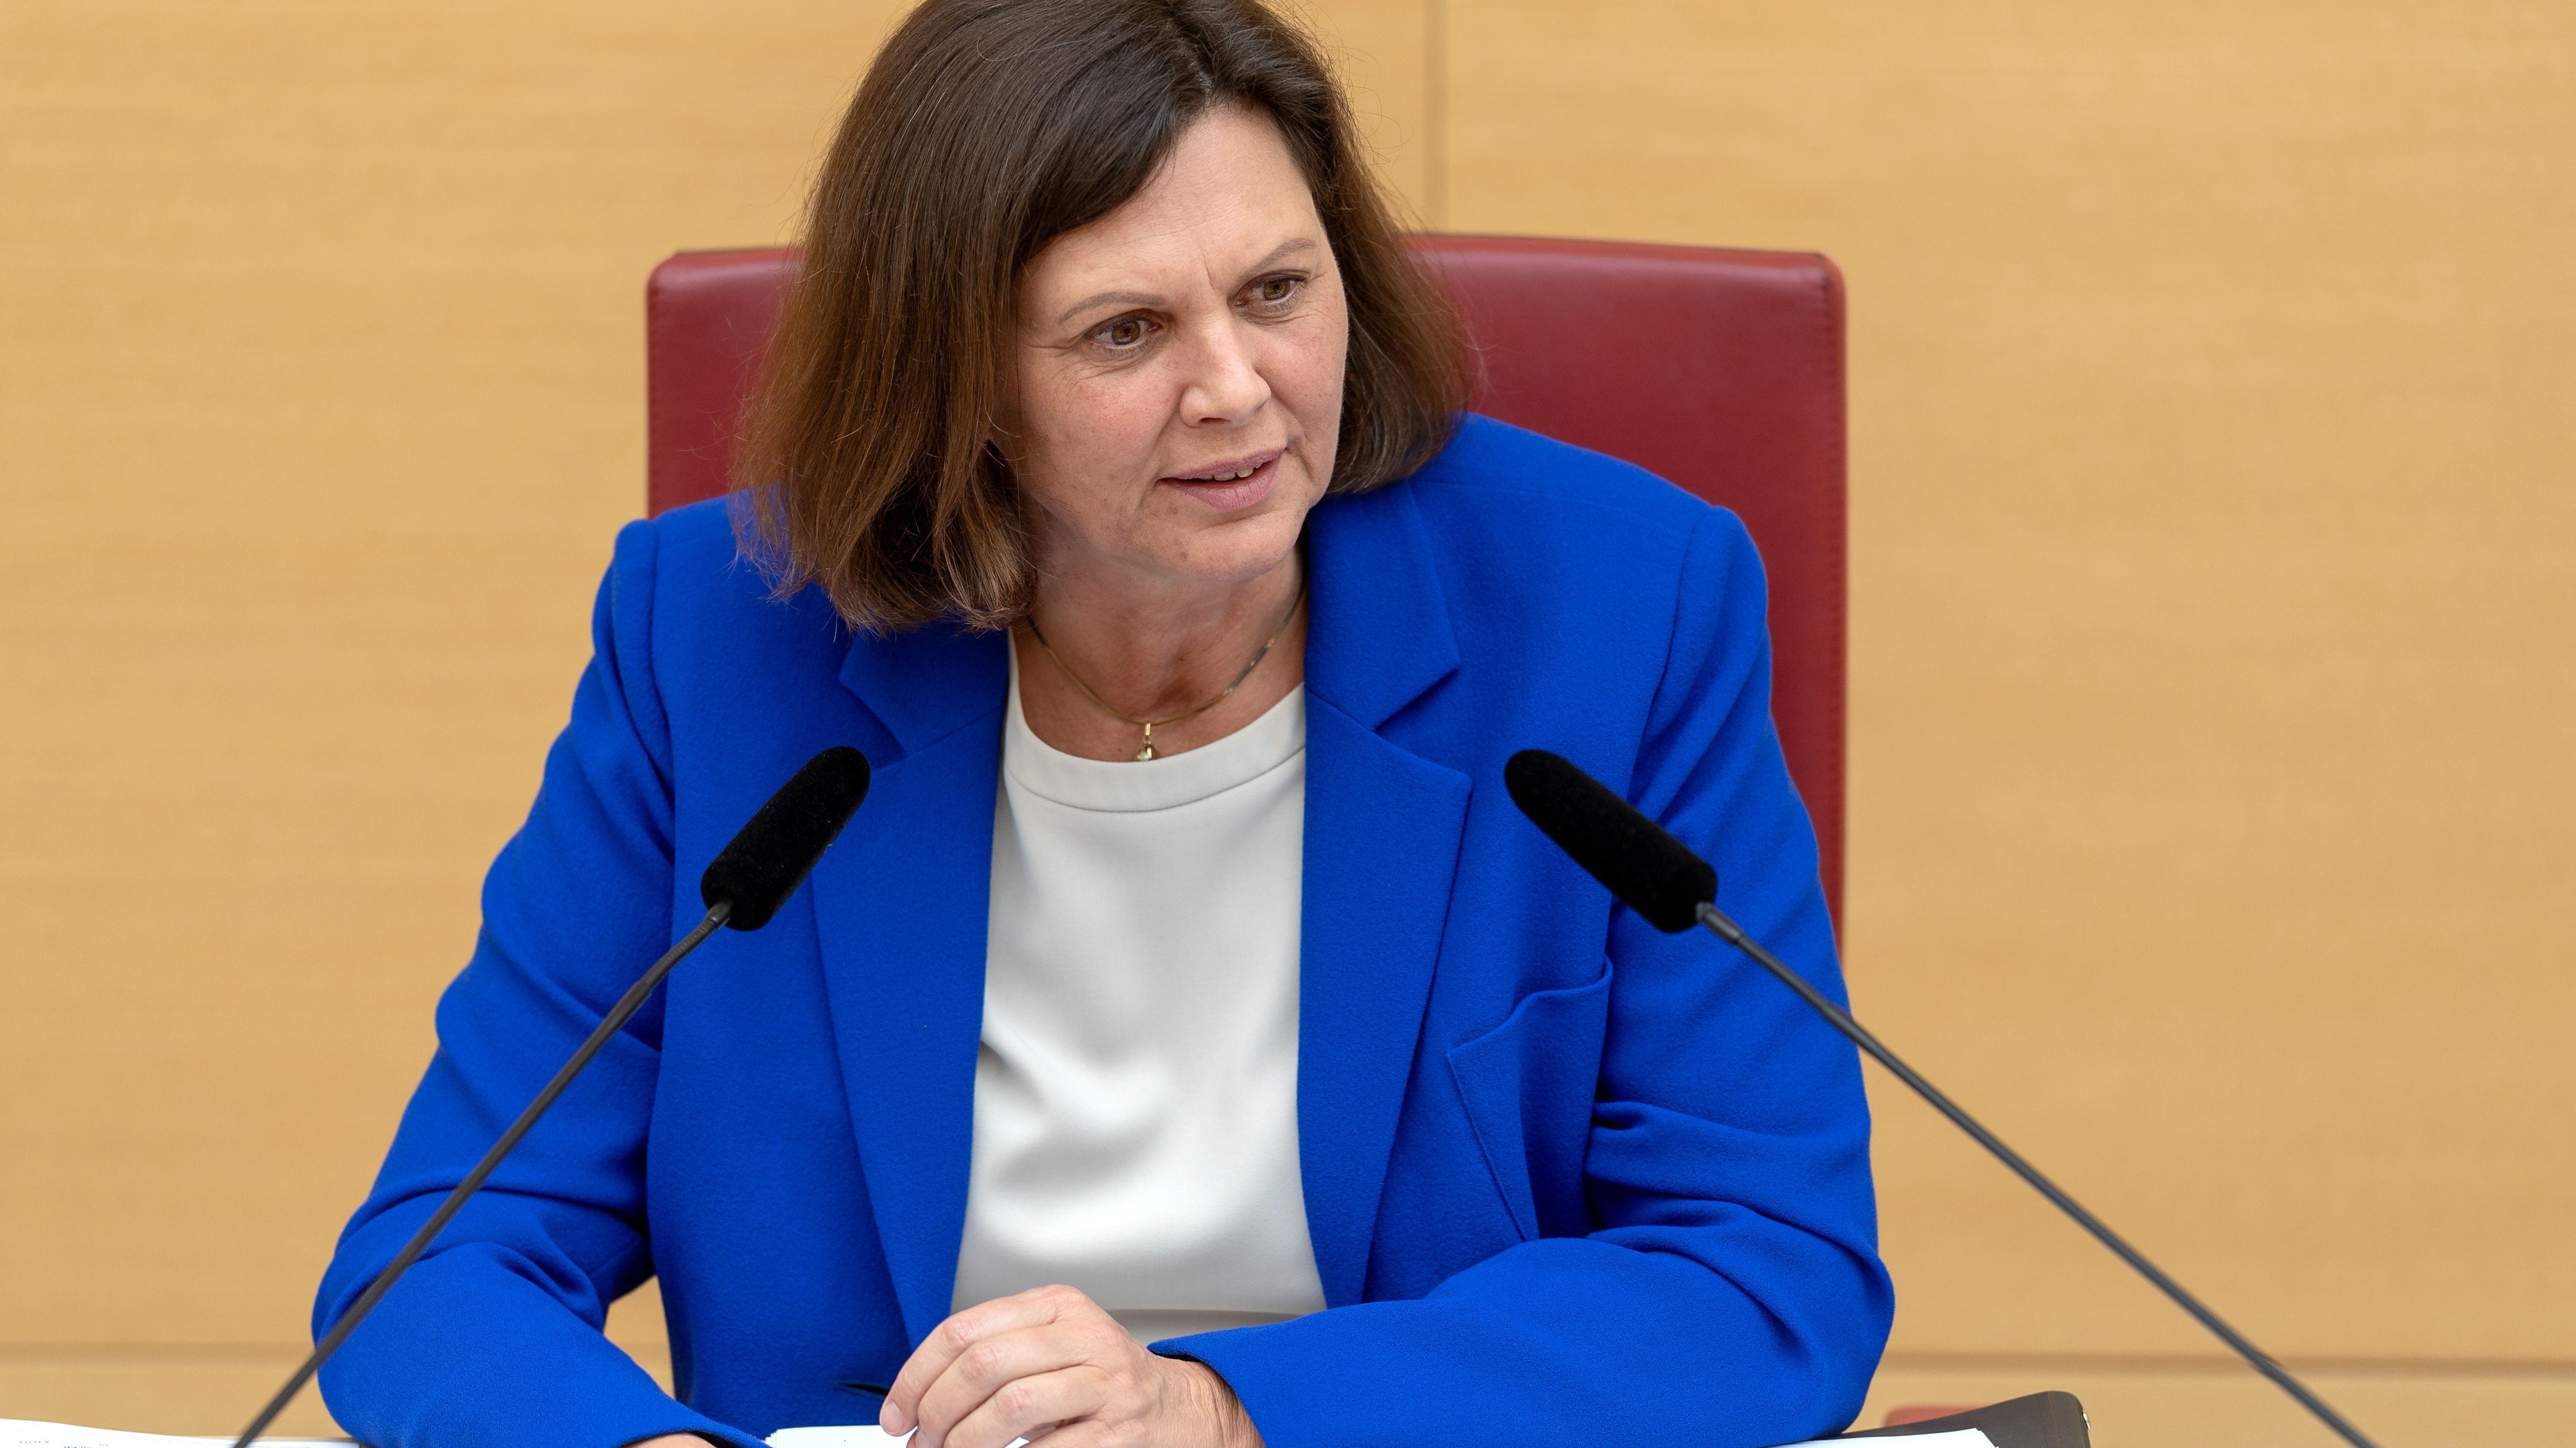 Bayerns Landtagspräsidentin Ilse Aigner (CSU)